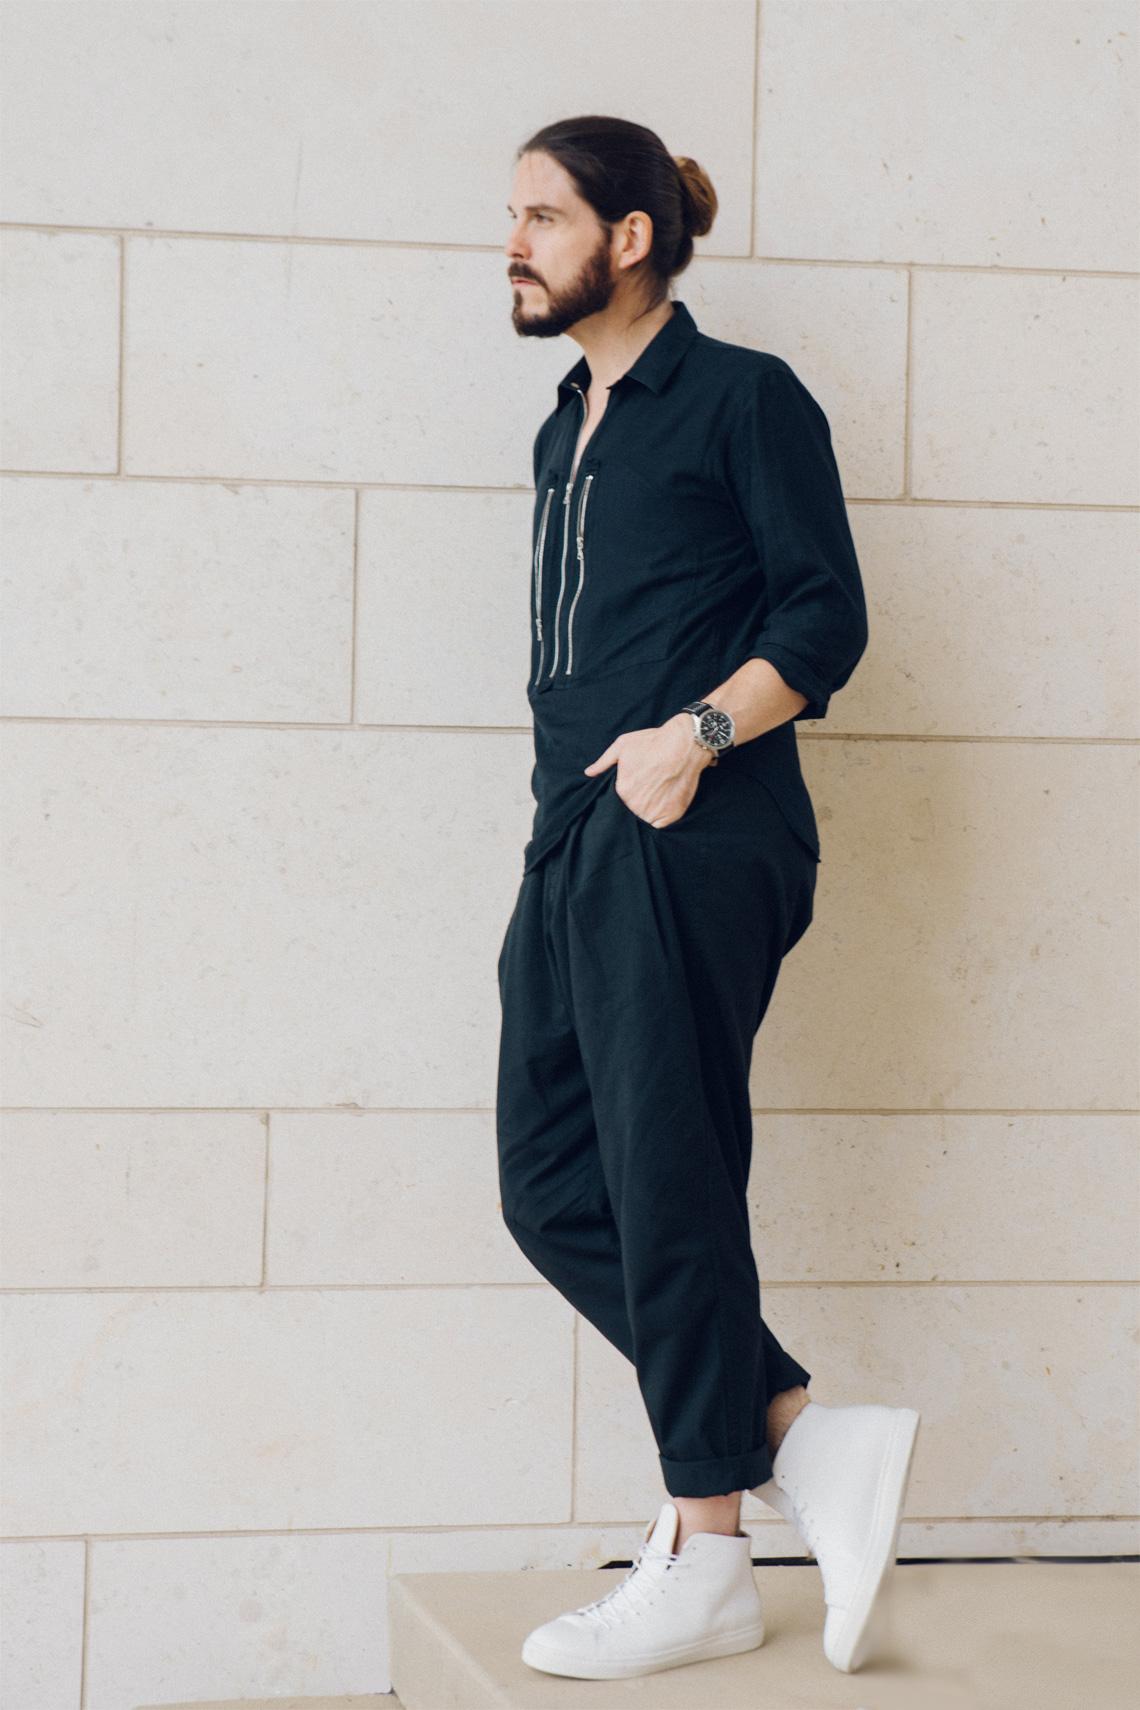 outfit leichter sommerlook mit schwarzer stoffhose. Black Bedroom Furniture Sets. Home Design Ideas